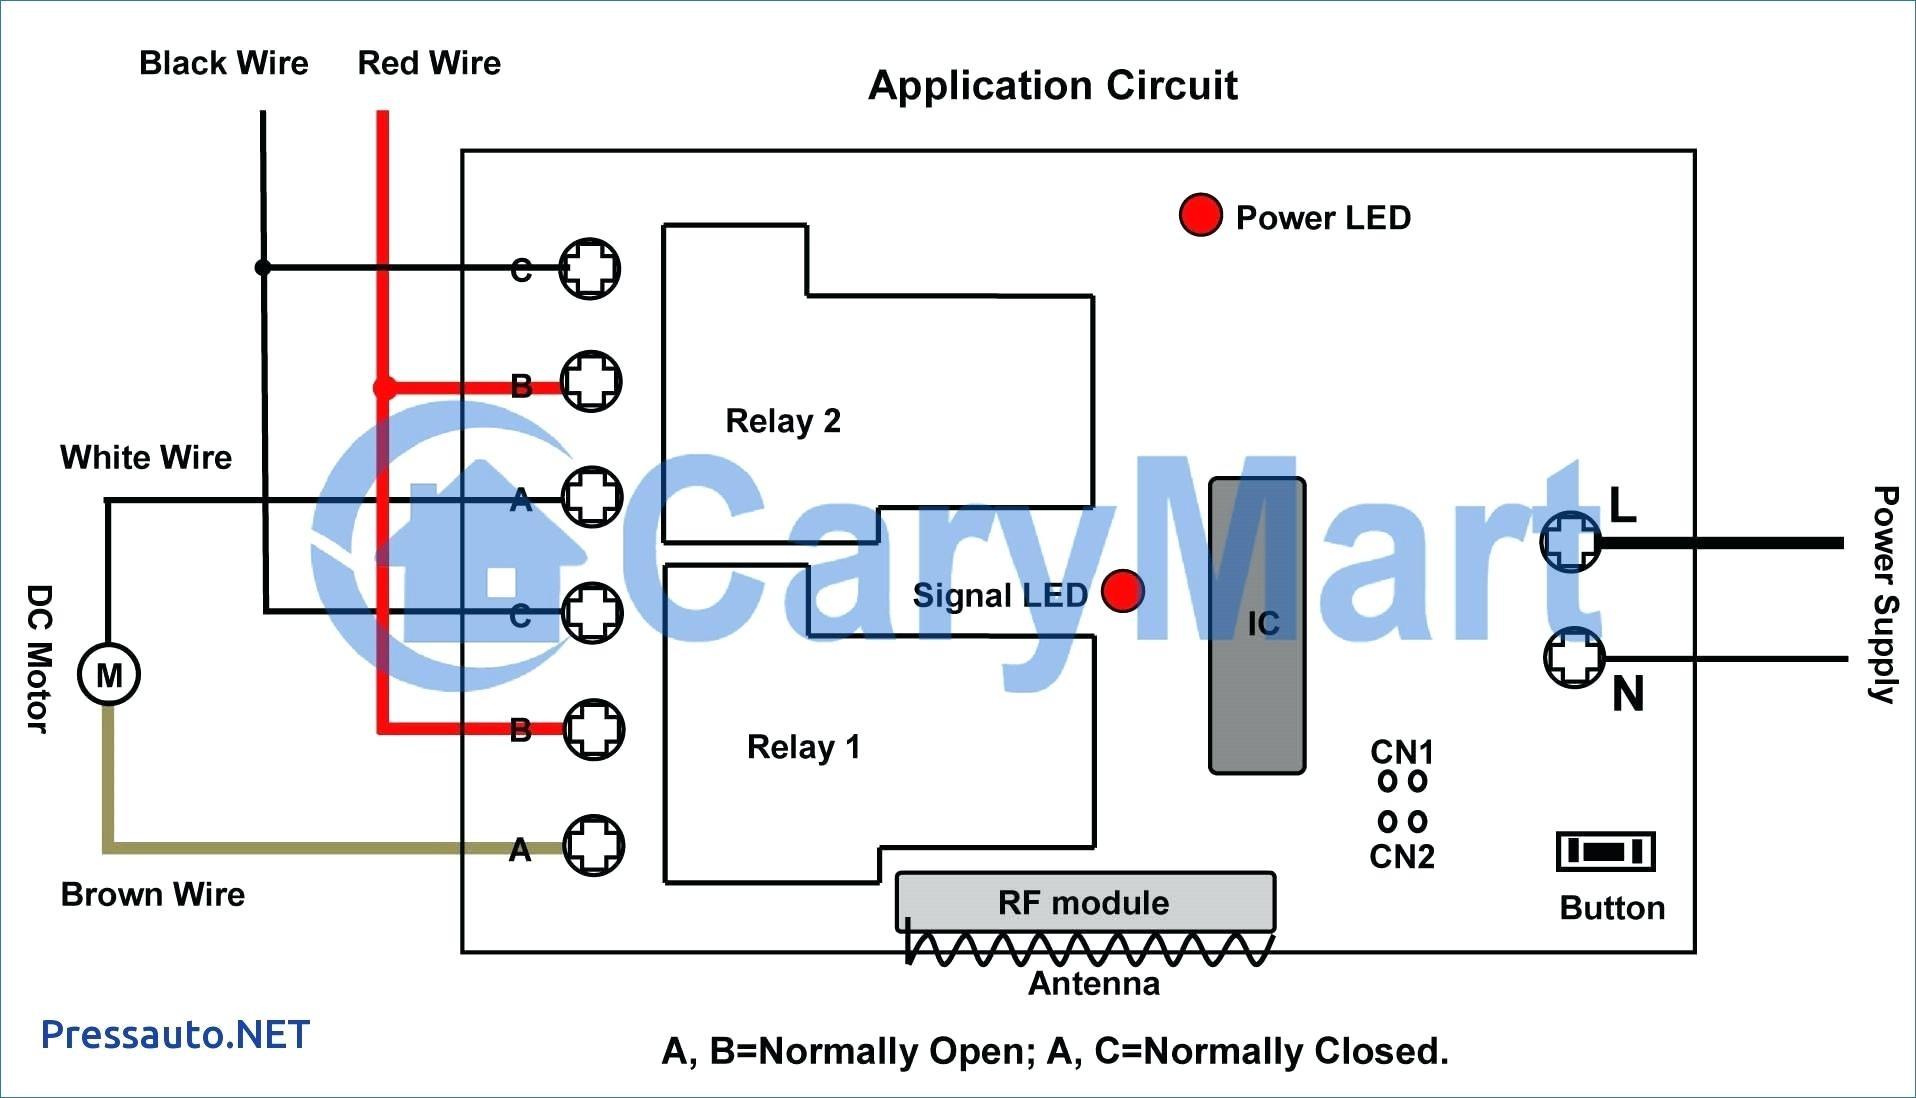 traveller winch wiring diagram Collection-Winch Wireless Remote Control Wiring Diagram Winch Controller Wiring Diagram Roc Grp org Endear In 16-a